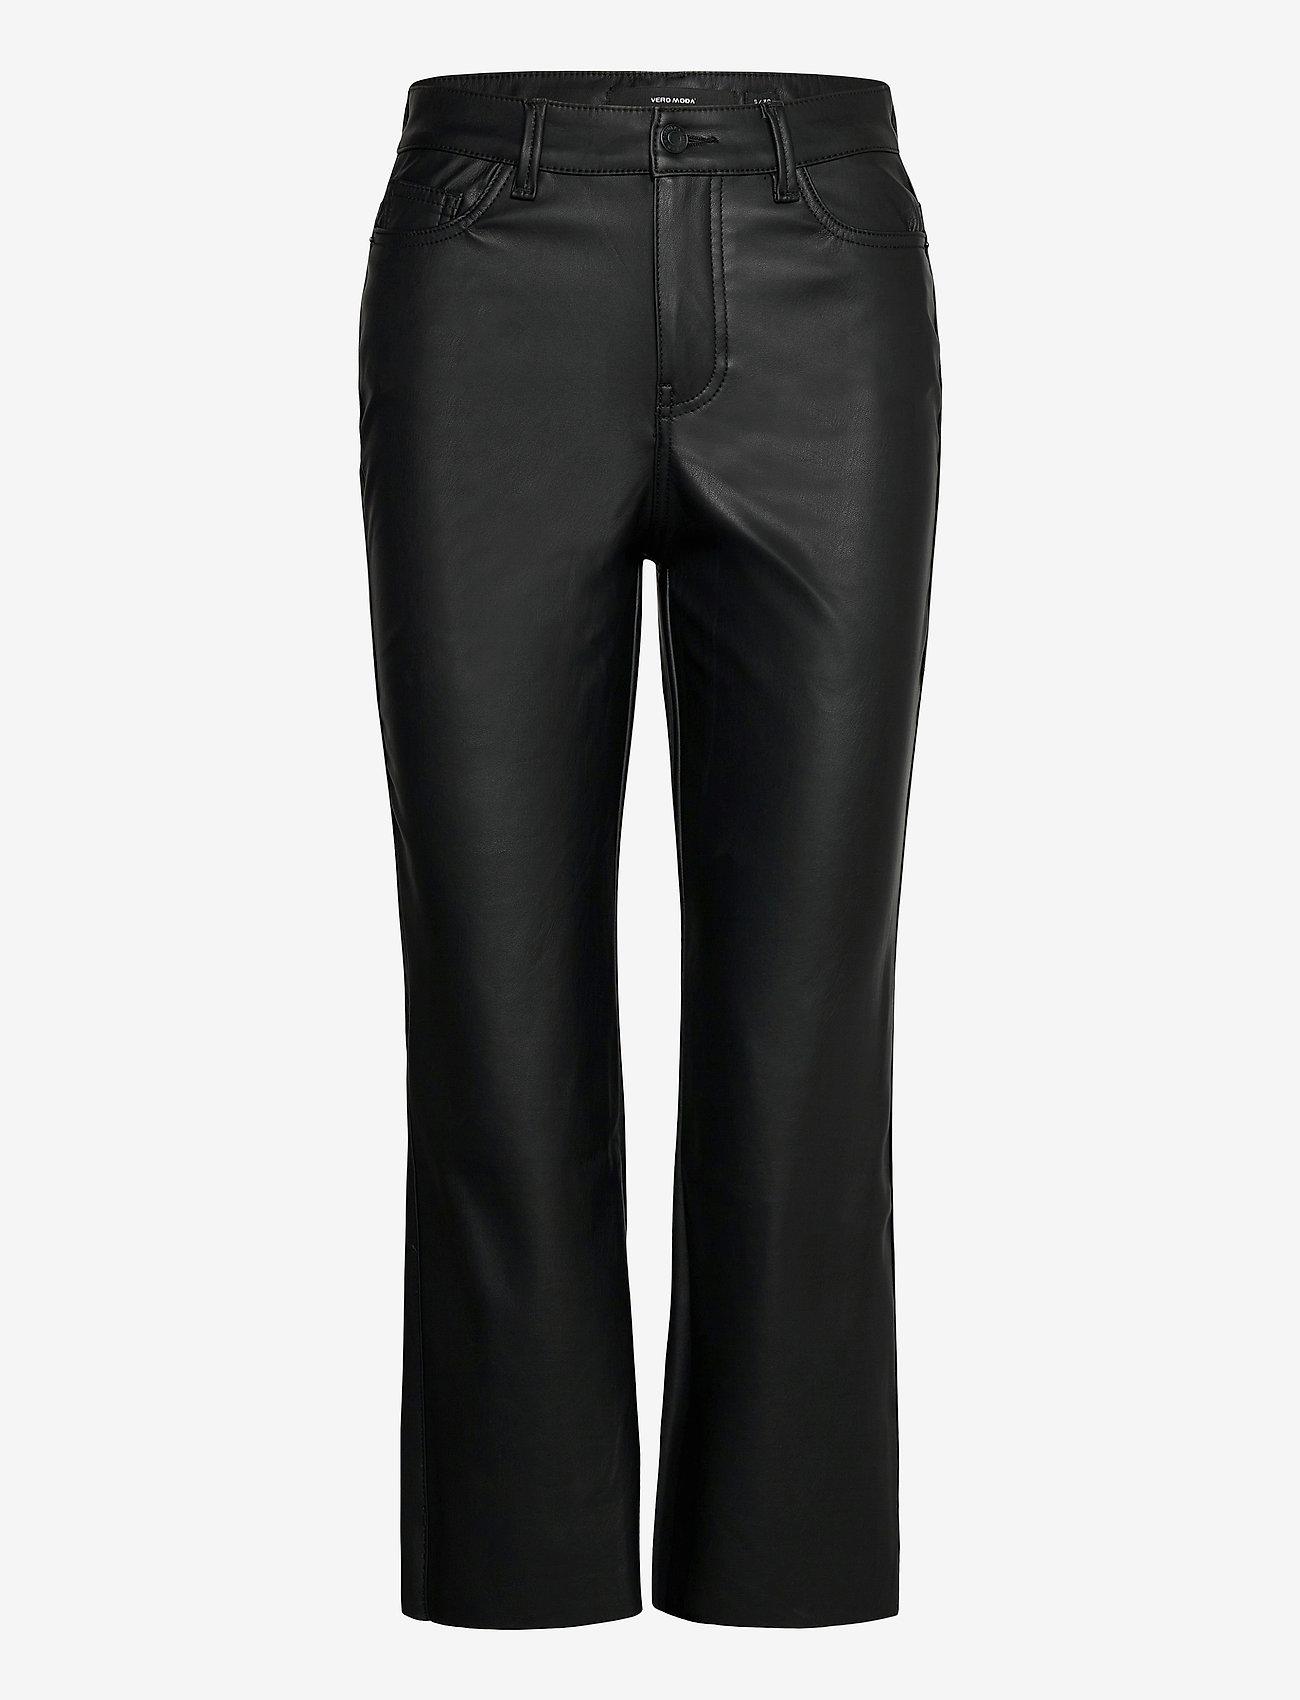 Vero Moda - VMSTELLA HR KICK FLARE PL COATED PANT - skinnbyxor - black - 0